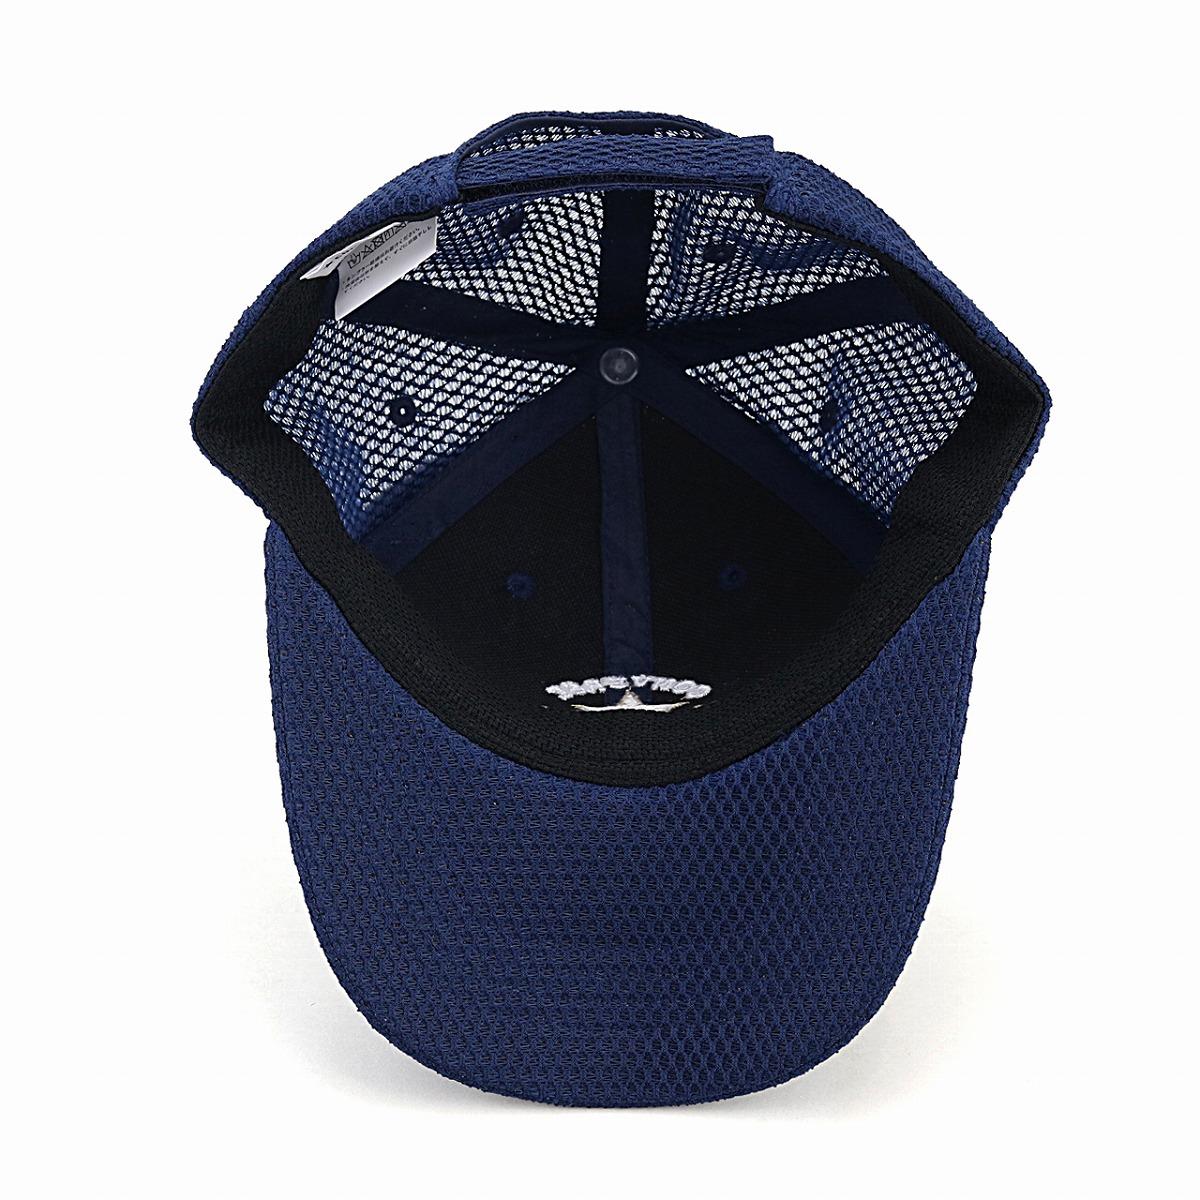 a139ff9dc11860 ... CONVERSE ALL STAR logo cap big size mesh cap sports cool Converse all-stars  moisture